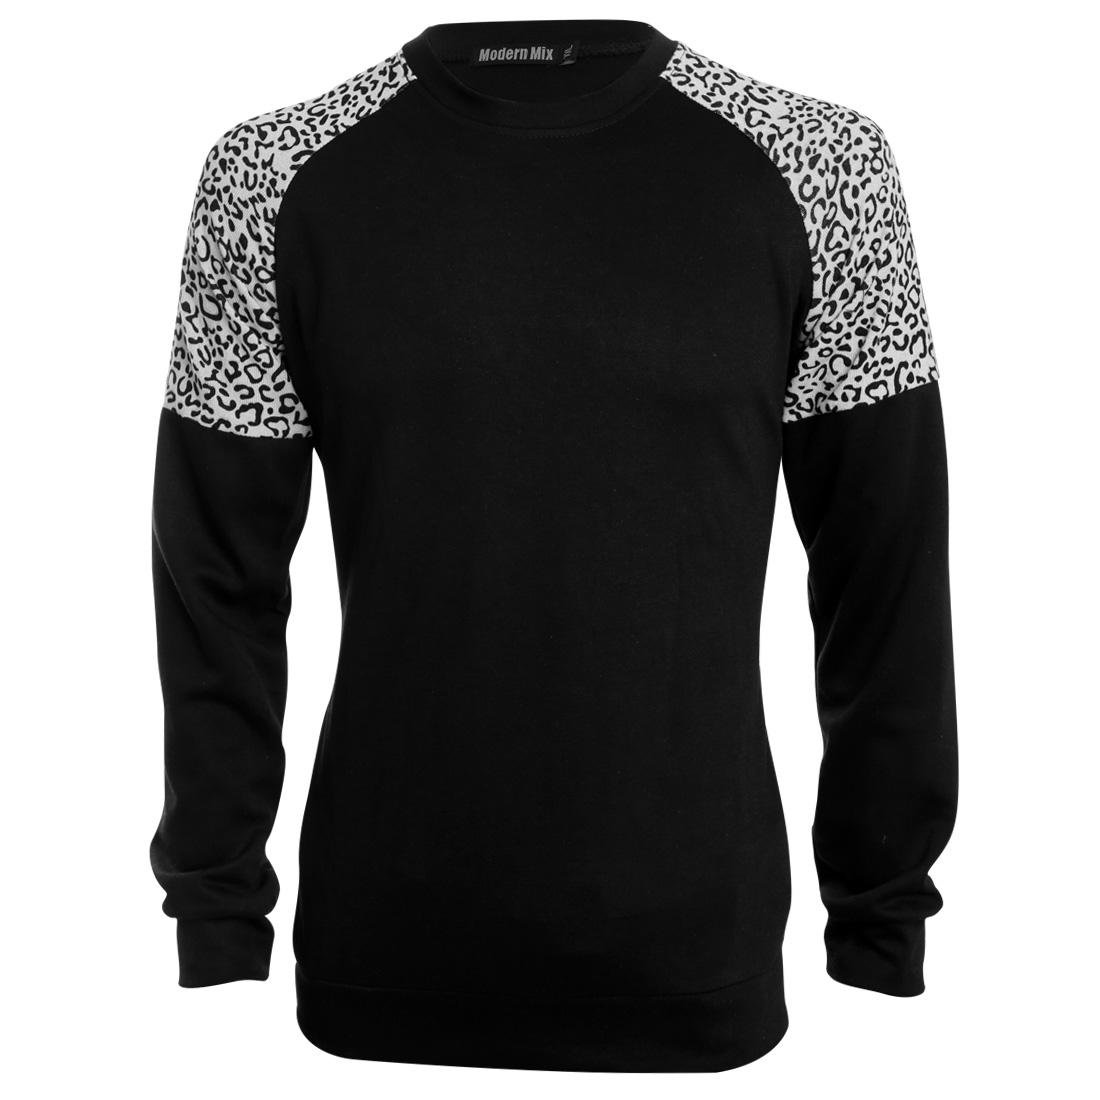 Man Black Round Neckline Long Sleeve Panel Leopard Pattern Shirt S